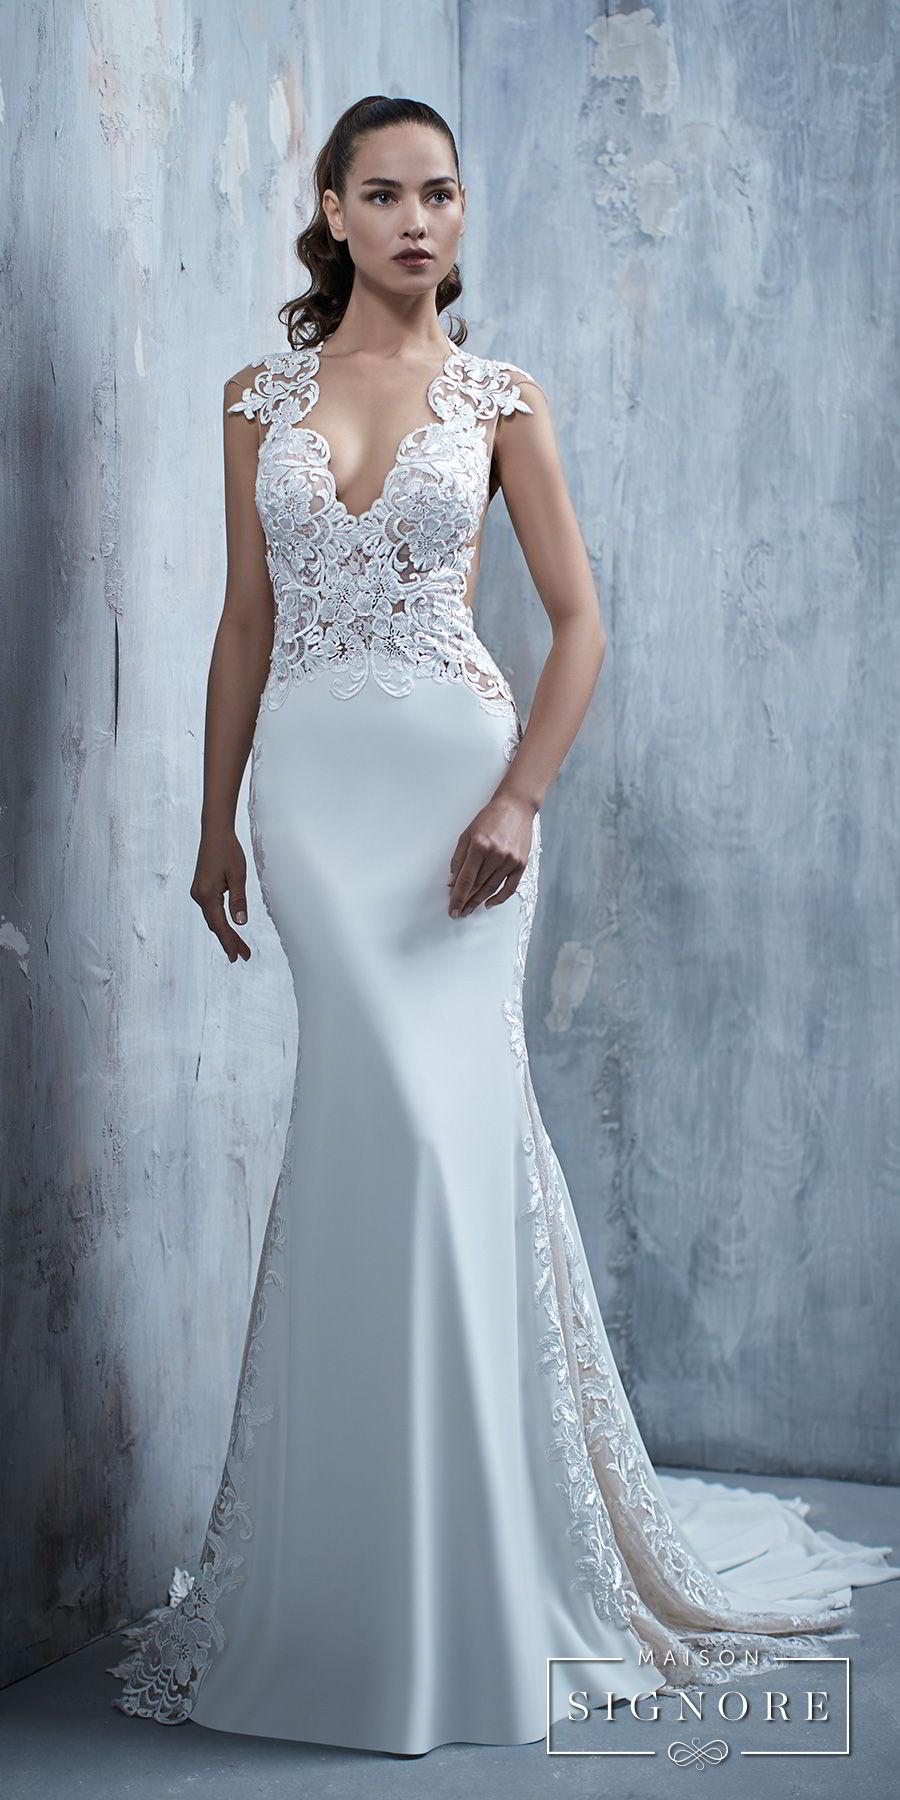 maison signore 2017 bridal cap sleeves deep v neck heavily embellished elegant fit and flare wedding dress chapel train (tessa) mv